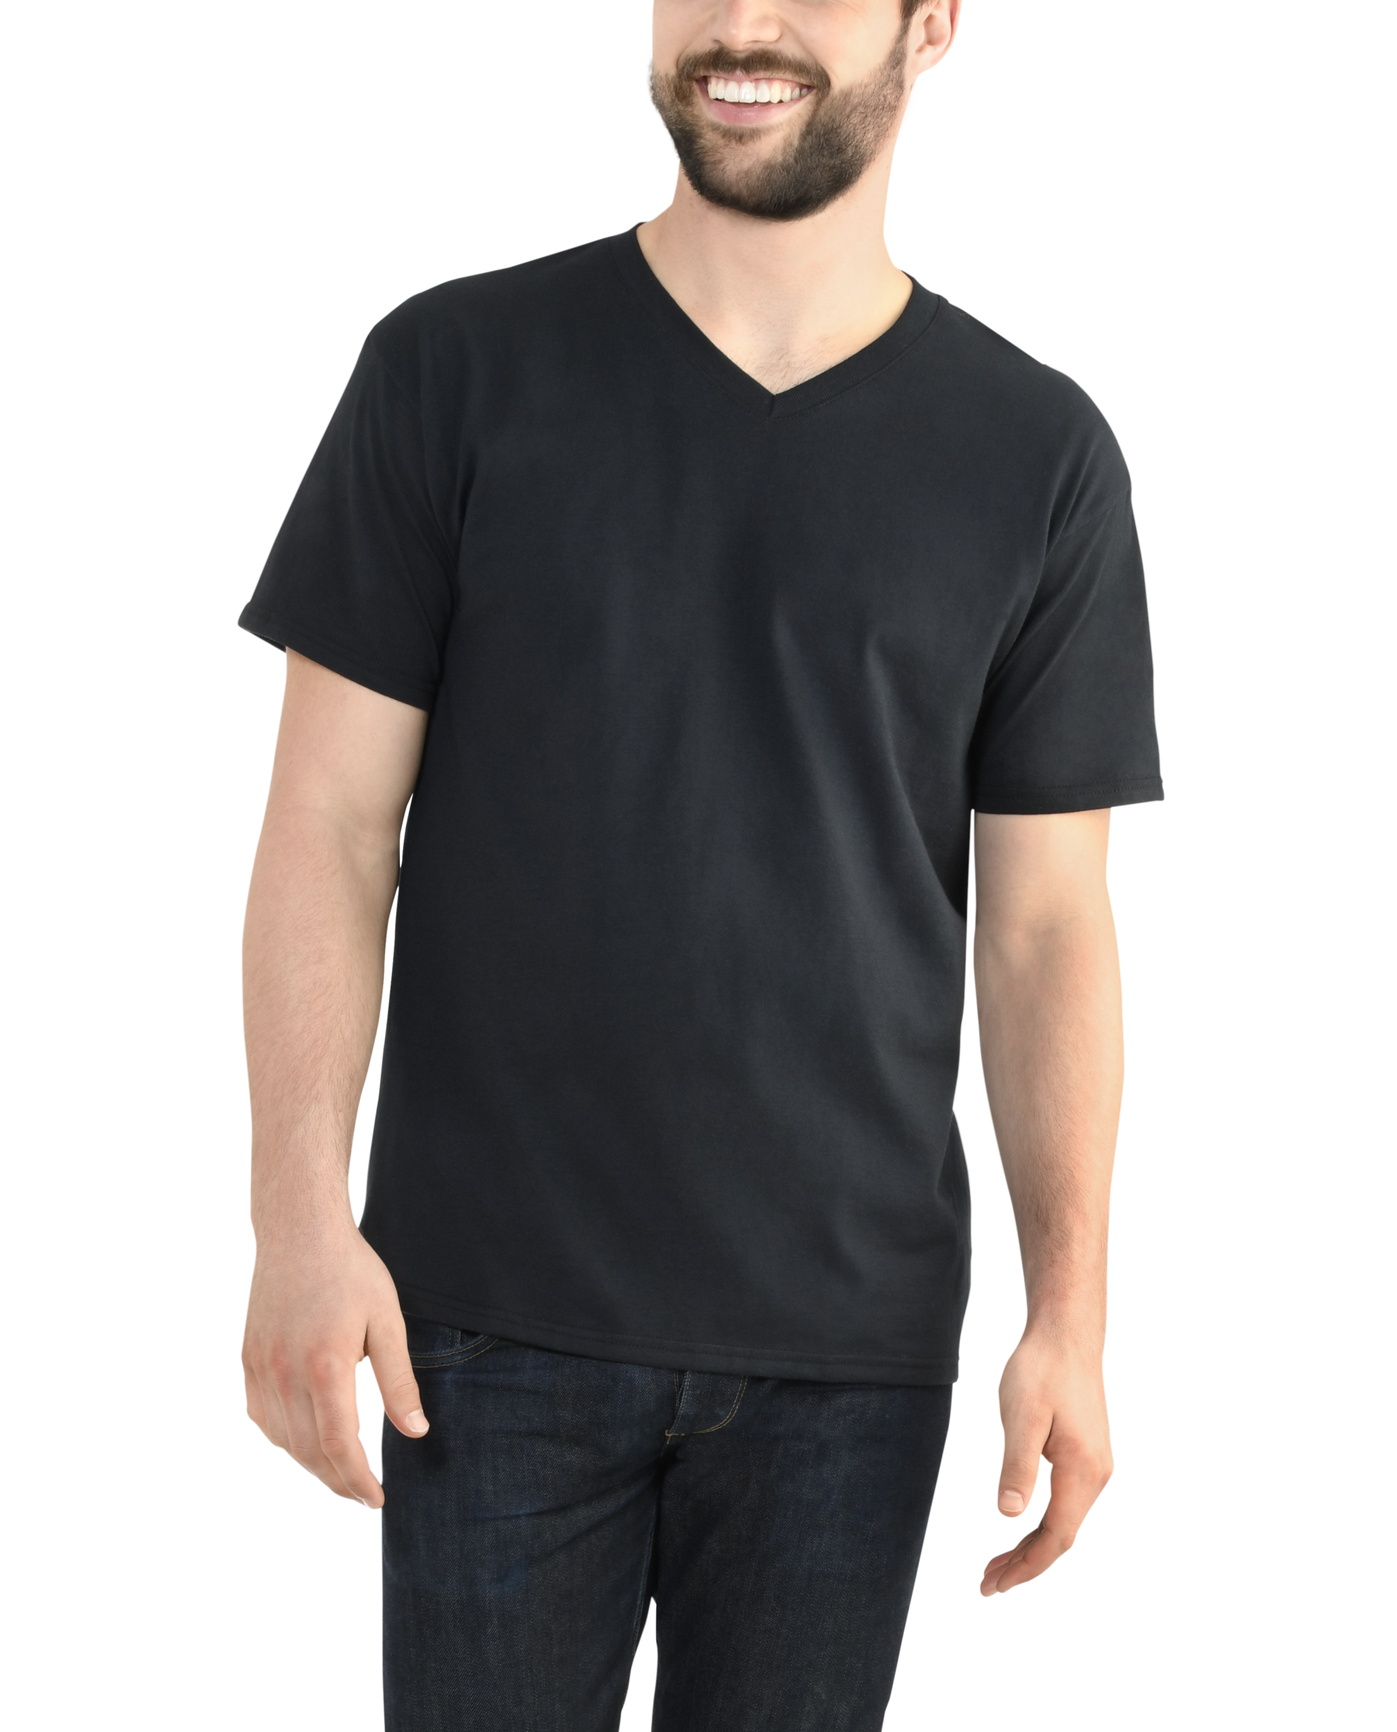 93e6c126b2 Men s EverSoft V-Neck T-Shirt - Fruit US